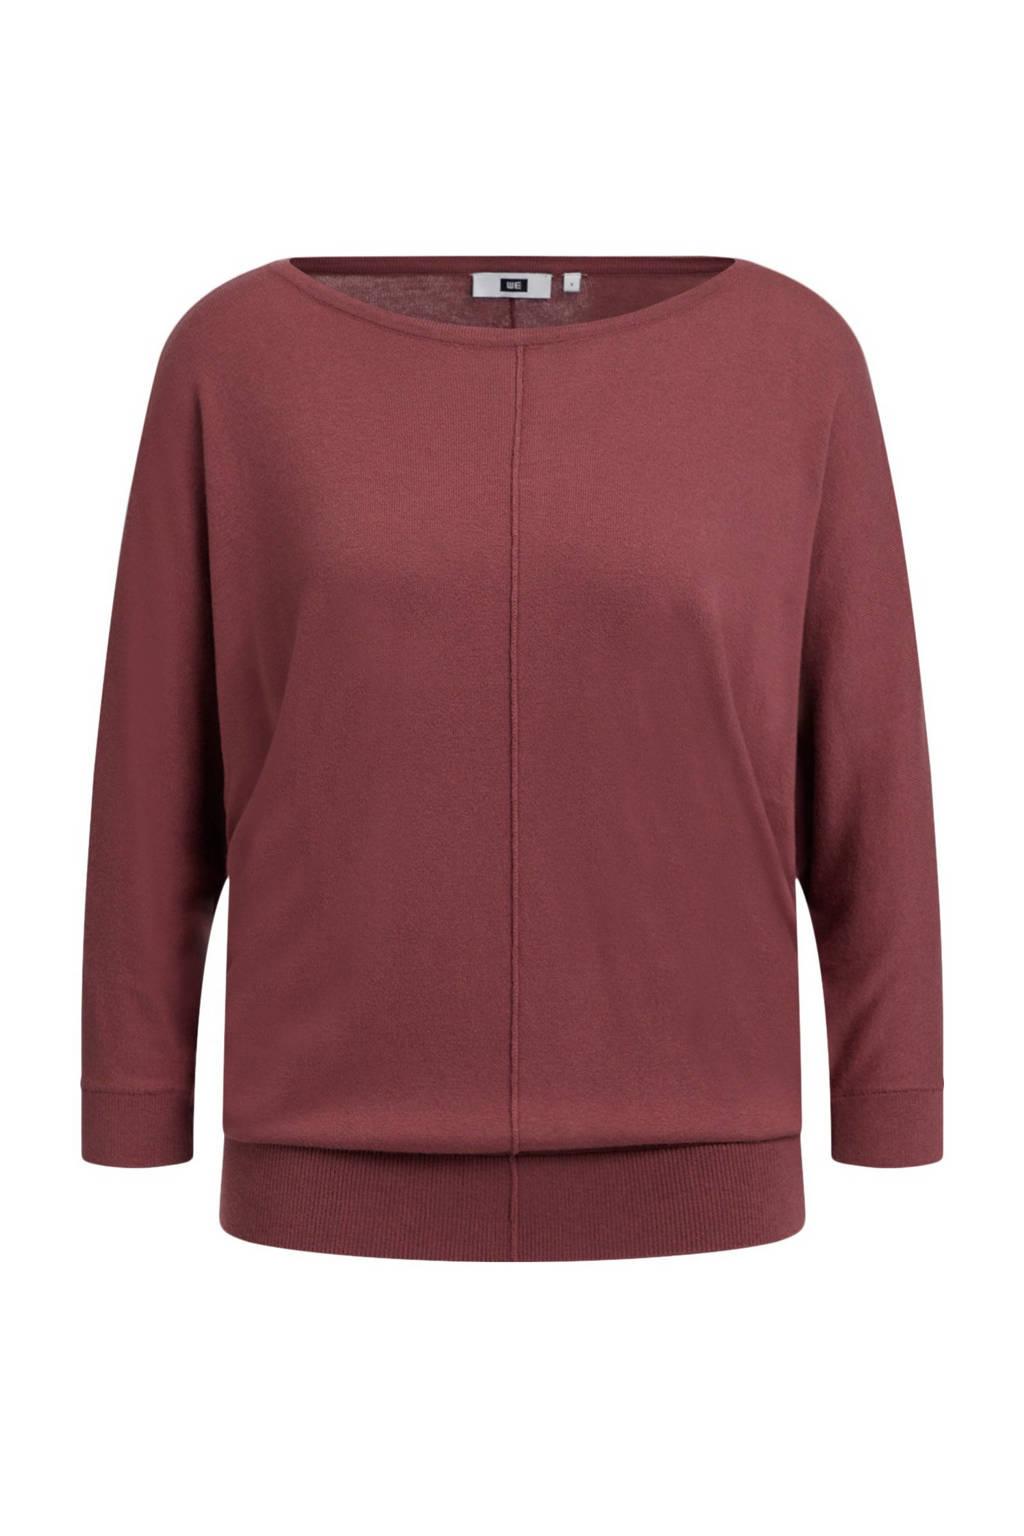 WE Fashion fijngebreide trui roodbruin, Roodbruin